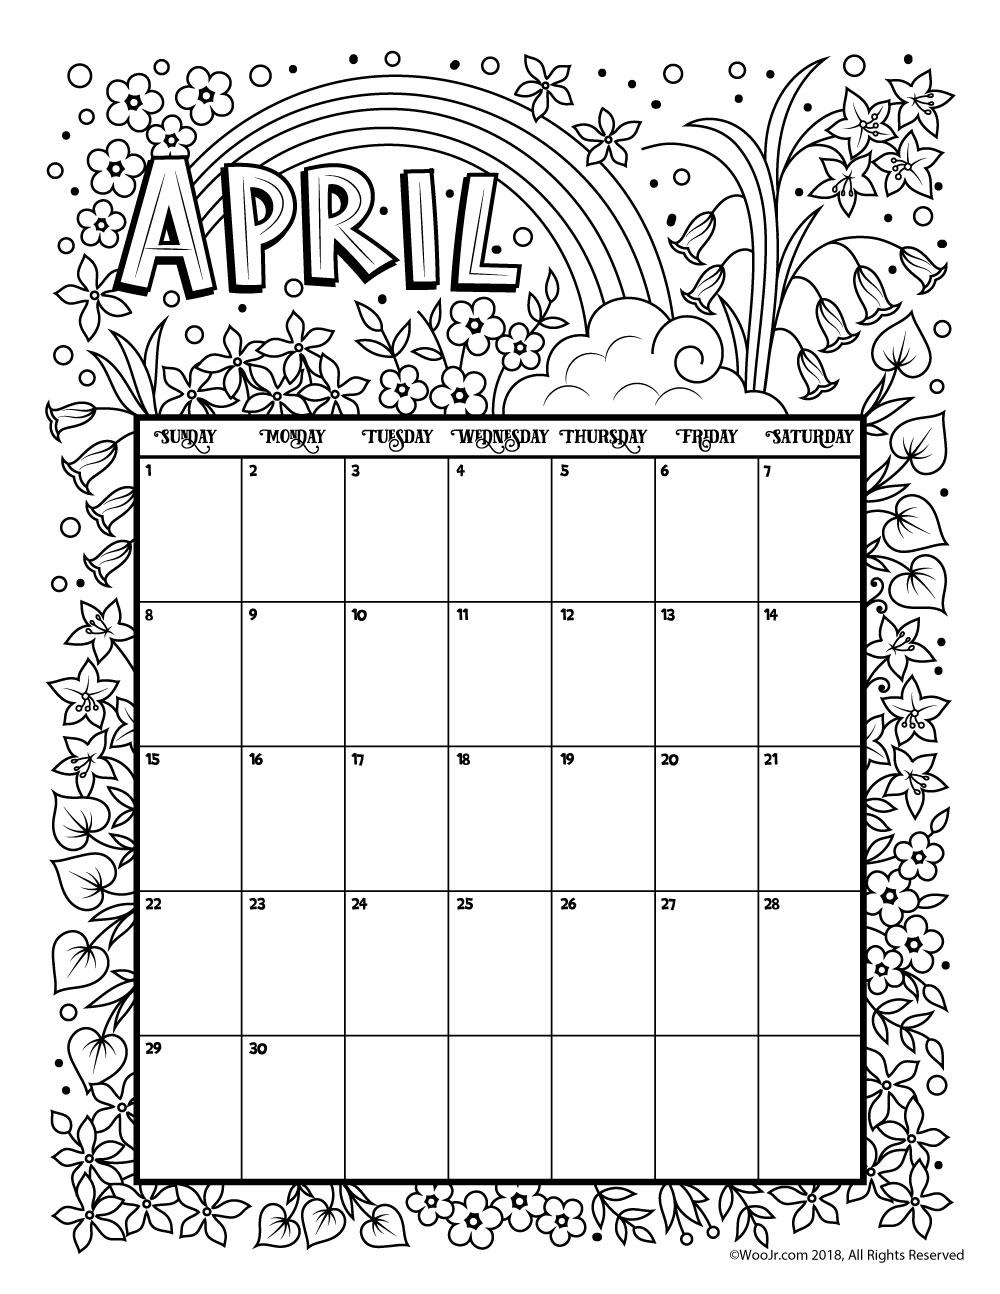 Printable Coloring Calendar For 2021 (And 2020!) | Woo! Jr